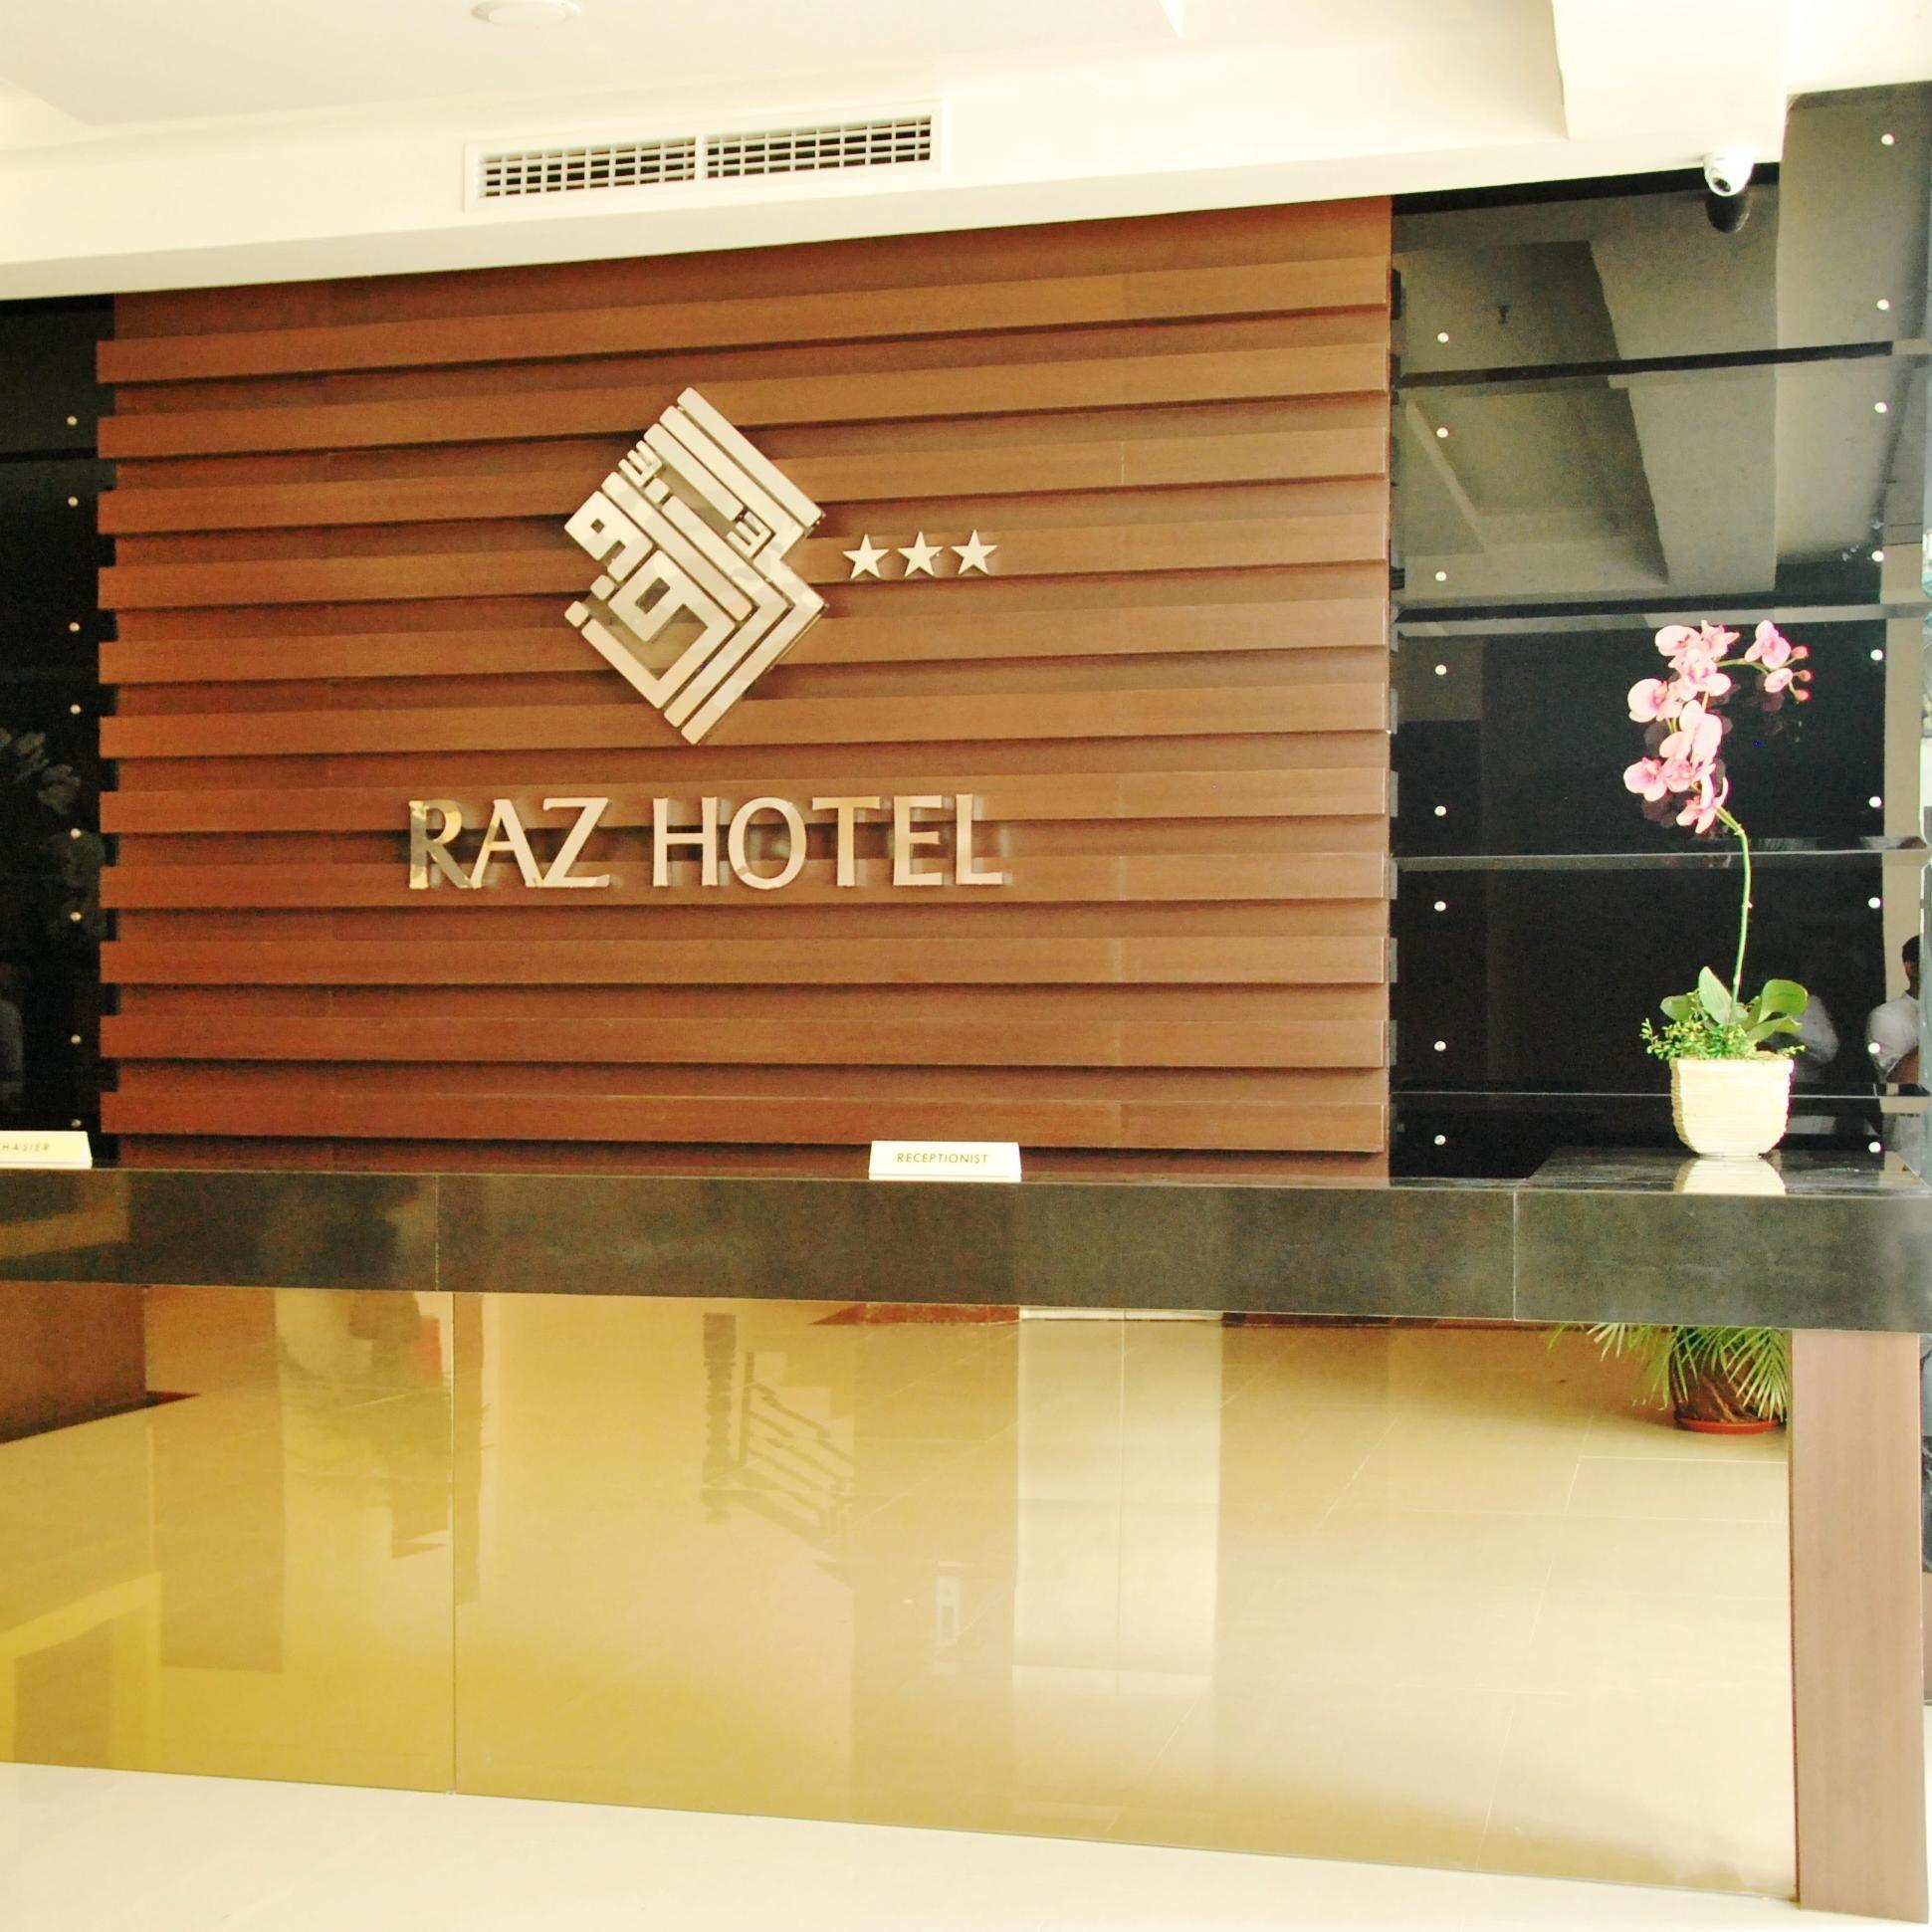 Raz Hotel